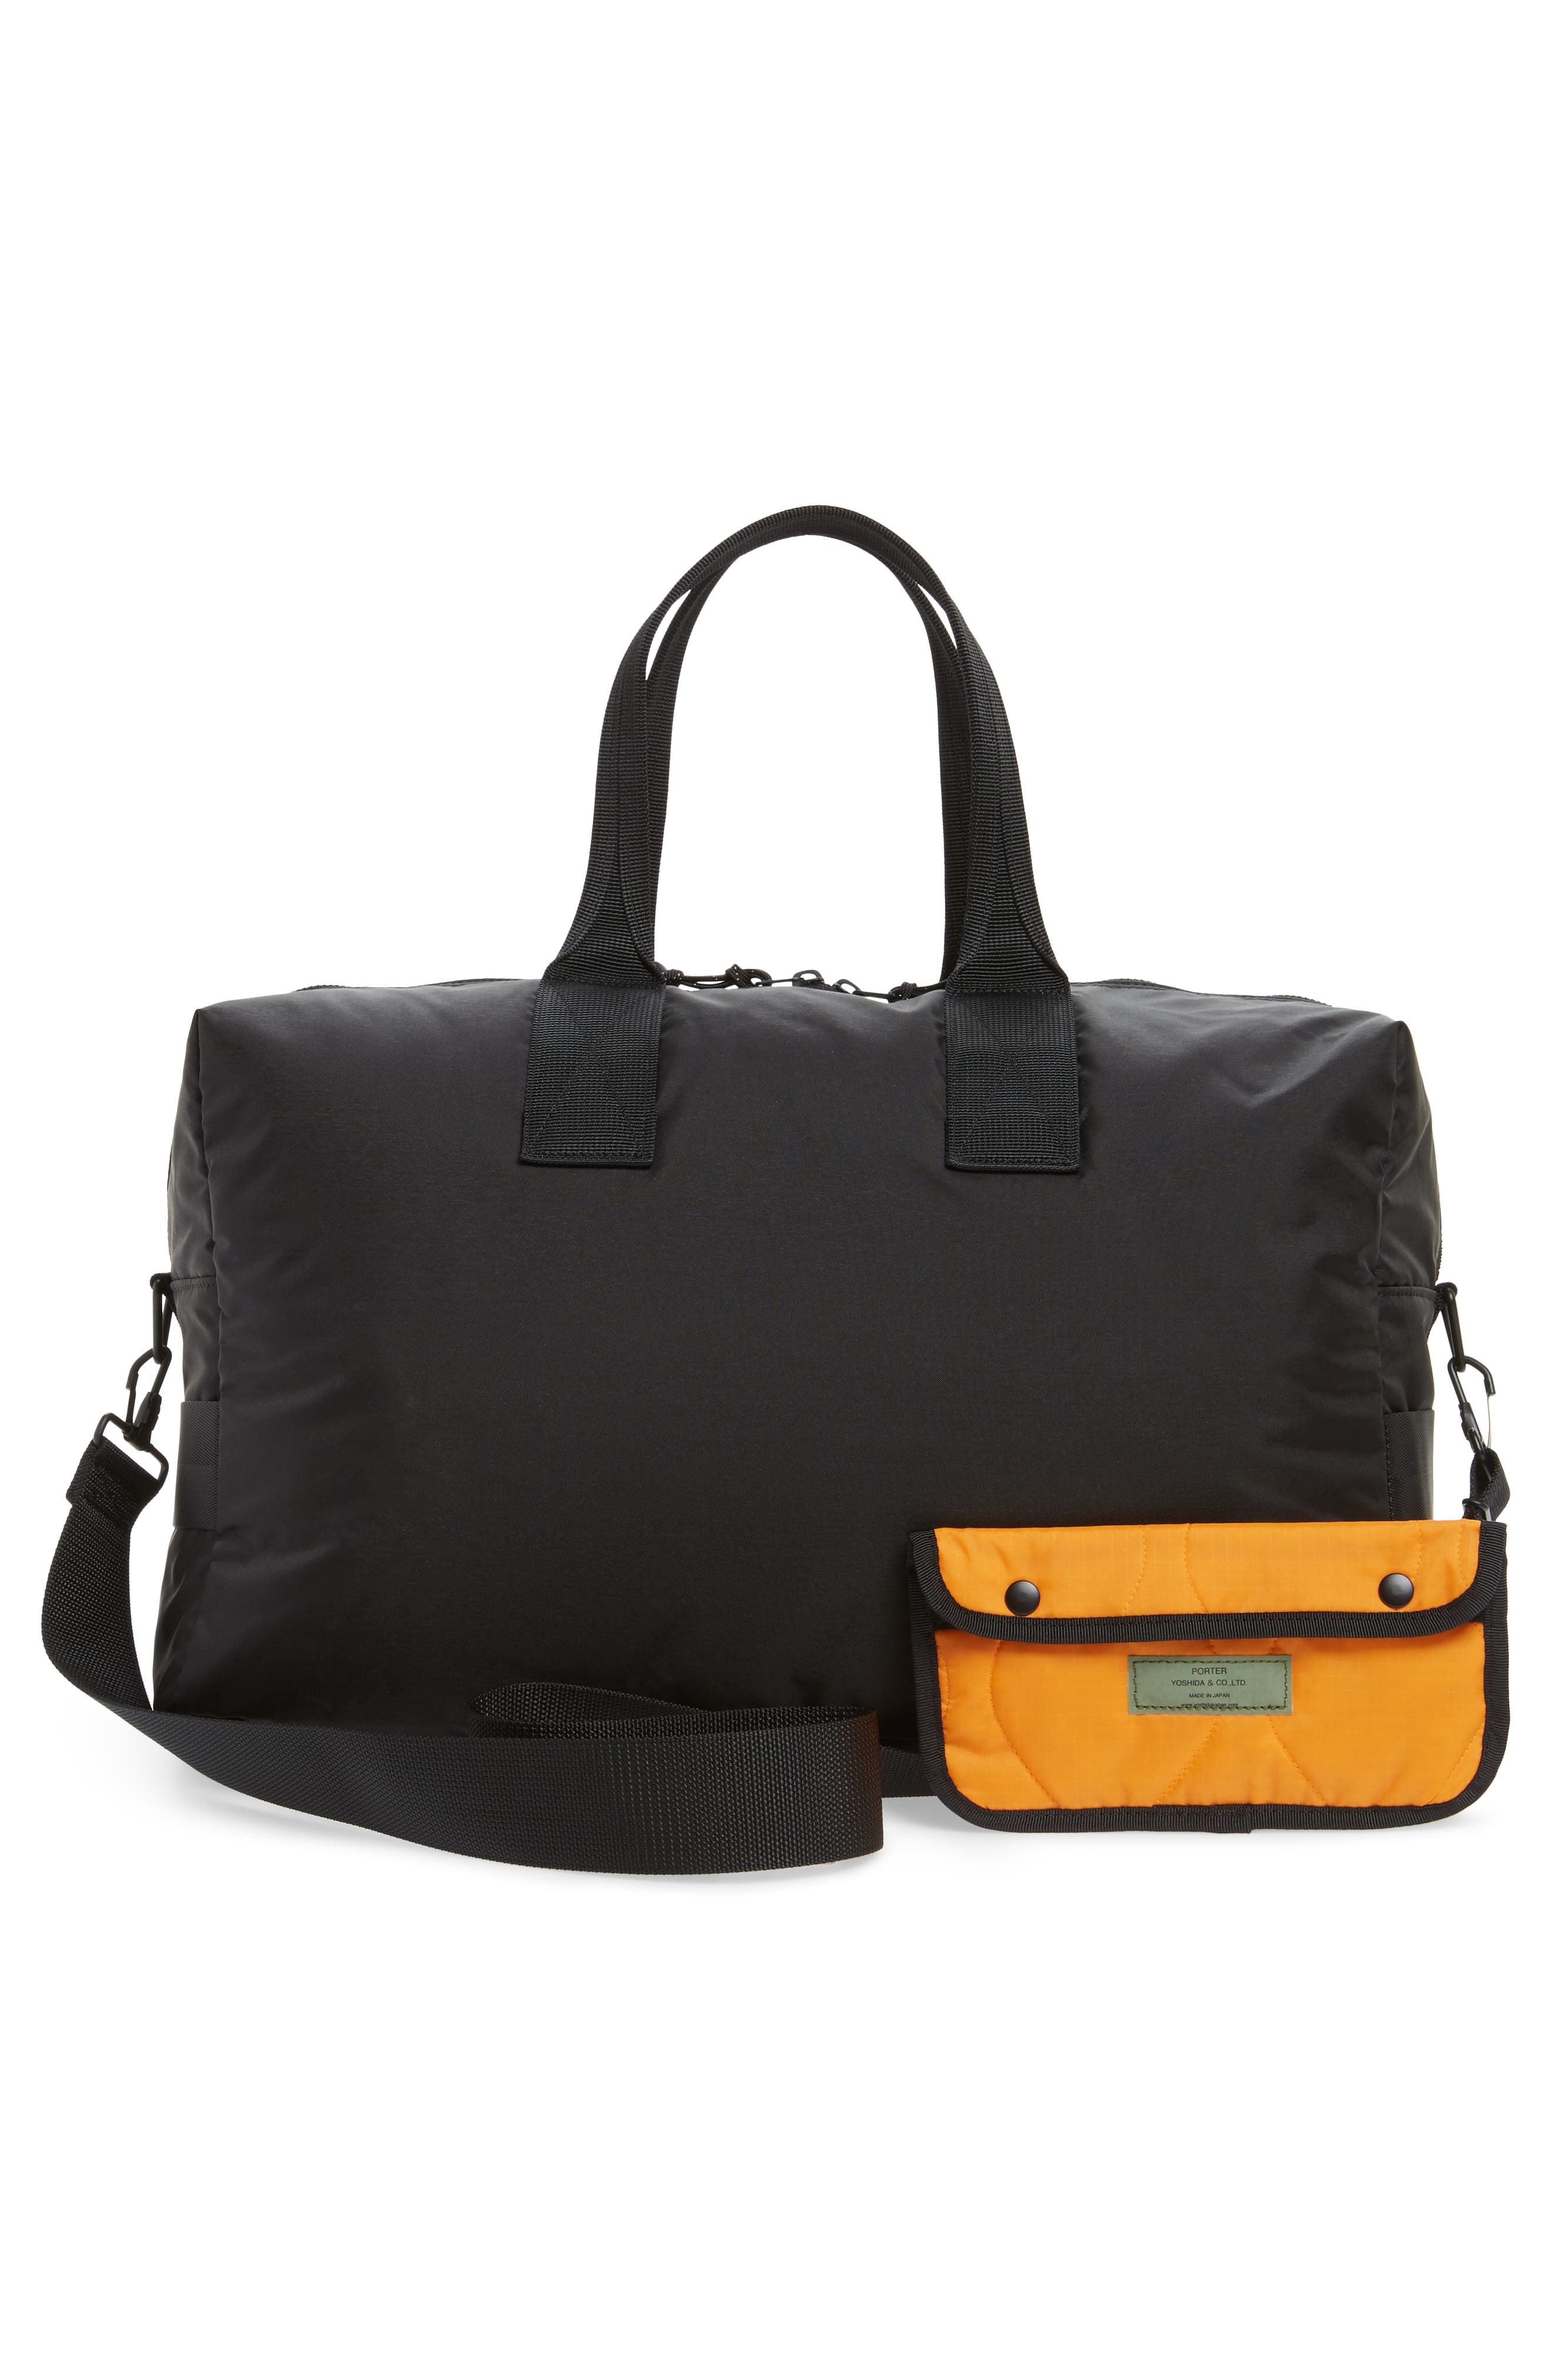 Porter-Yoshida & Co. Force Duffel Bag,                             Alternate thumbnail 3, color,                             Black